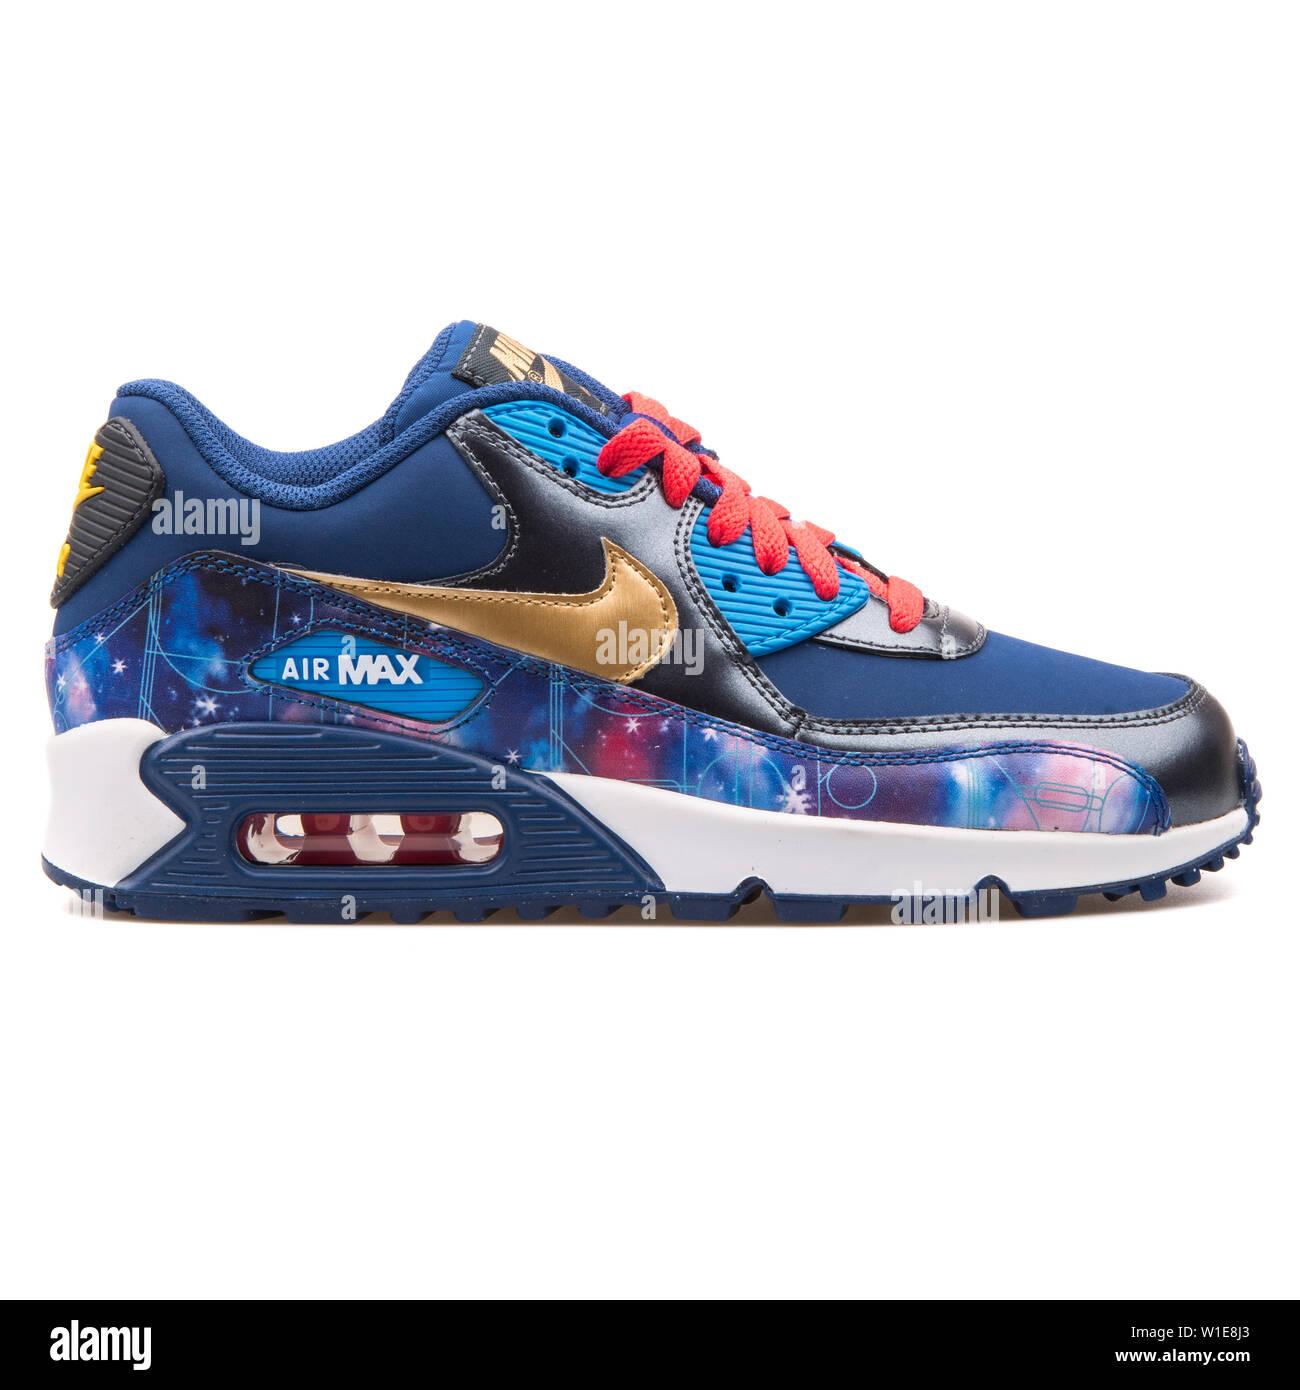 Nike Air Max 90 Premium Leather blue